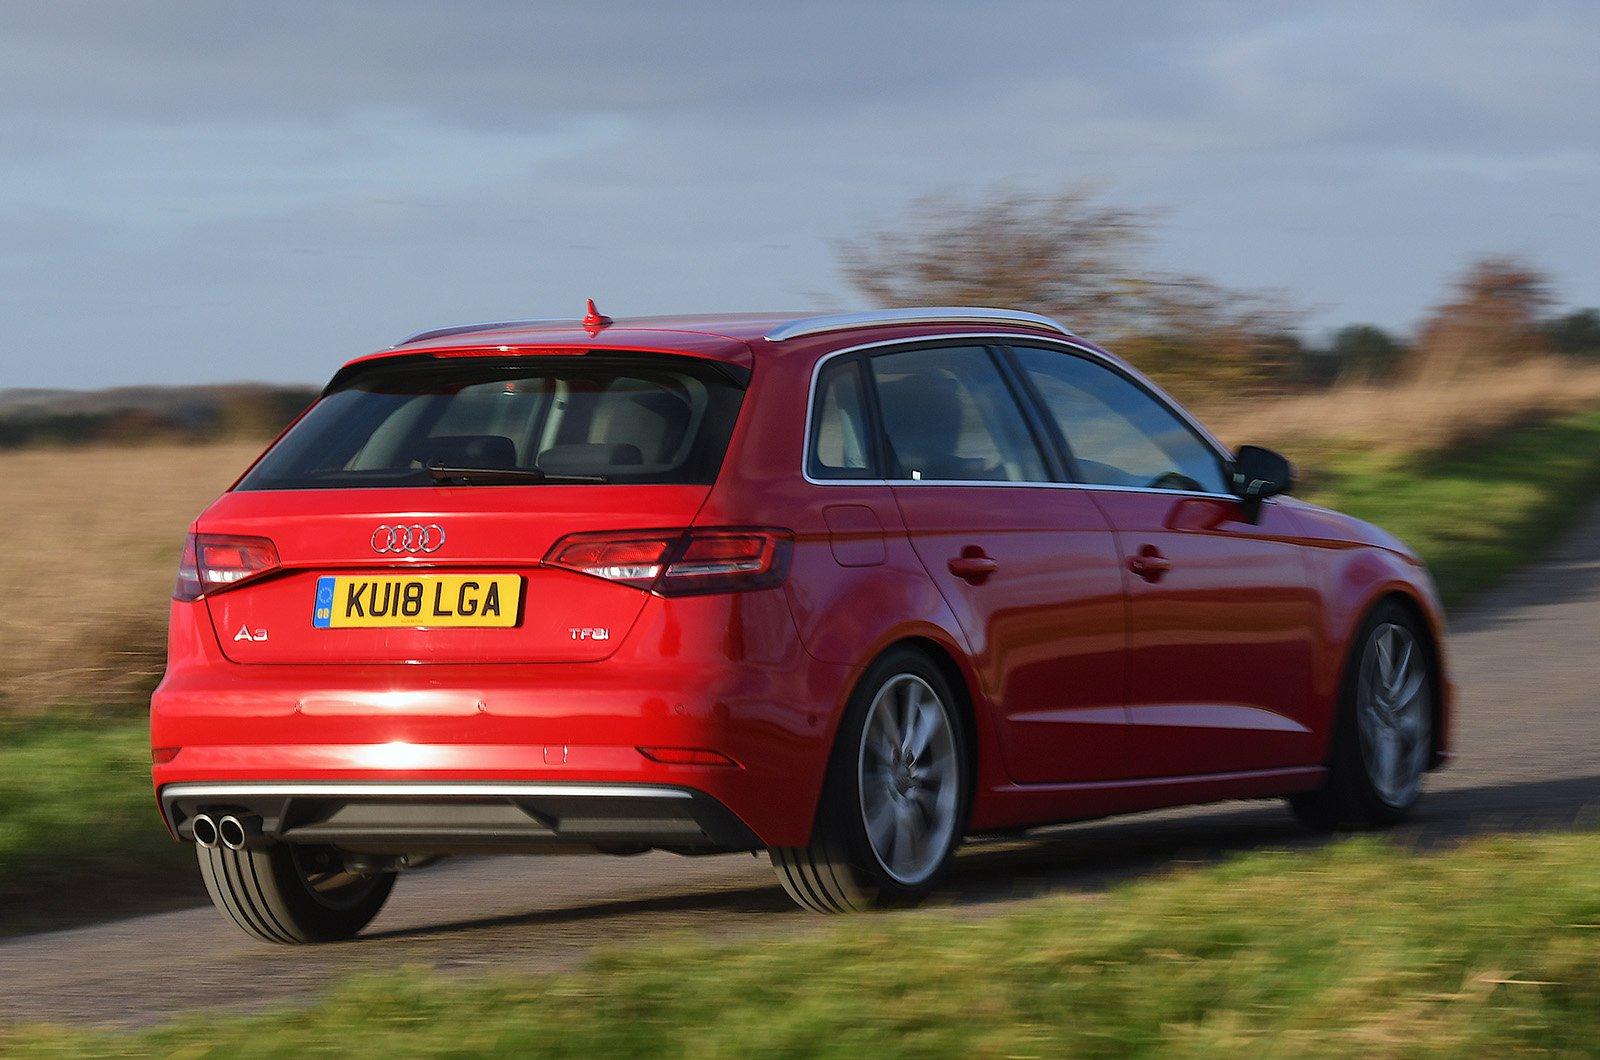 Used Audi A3 2013-present